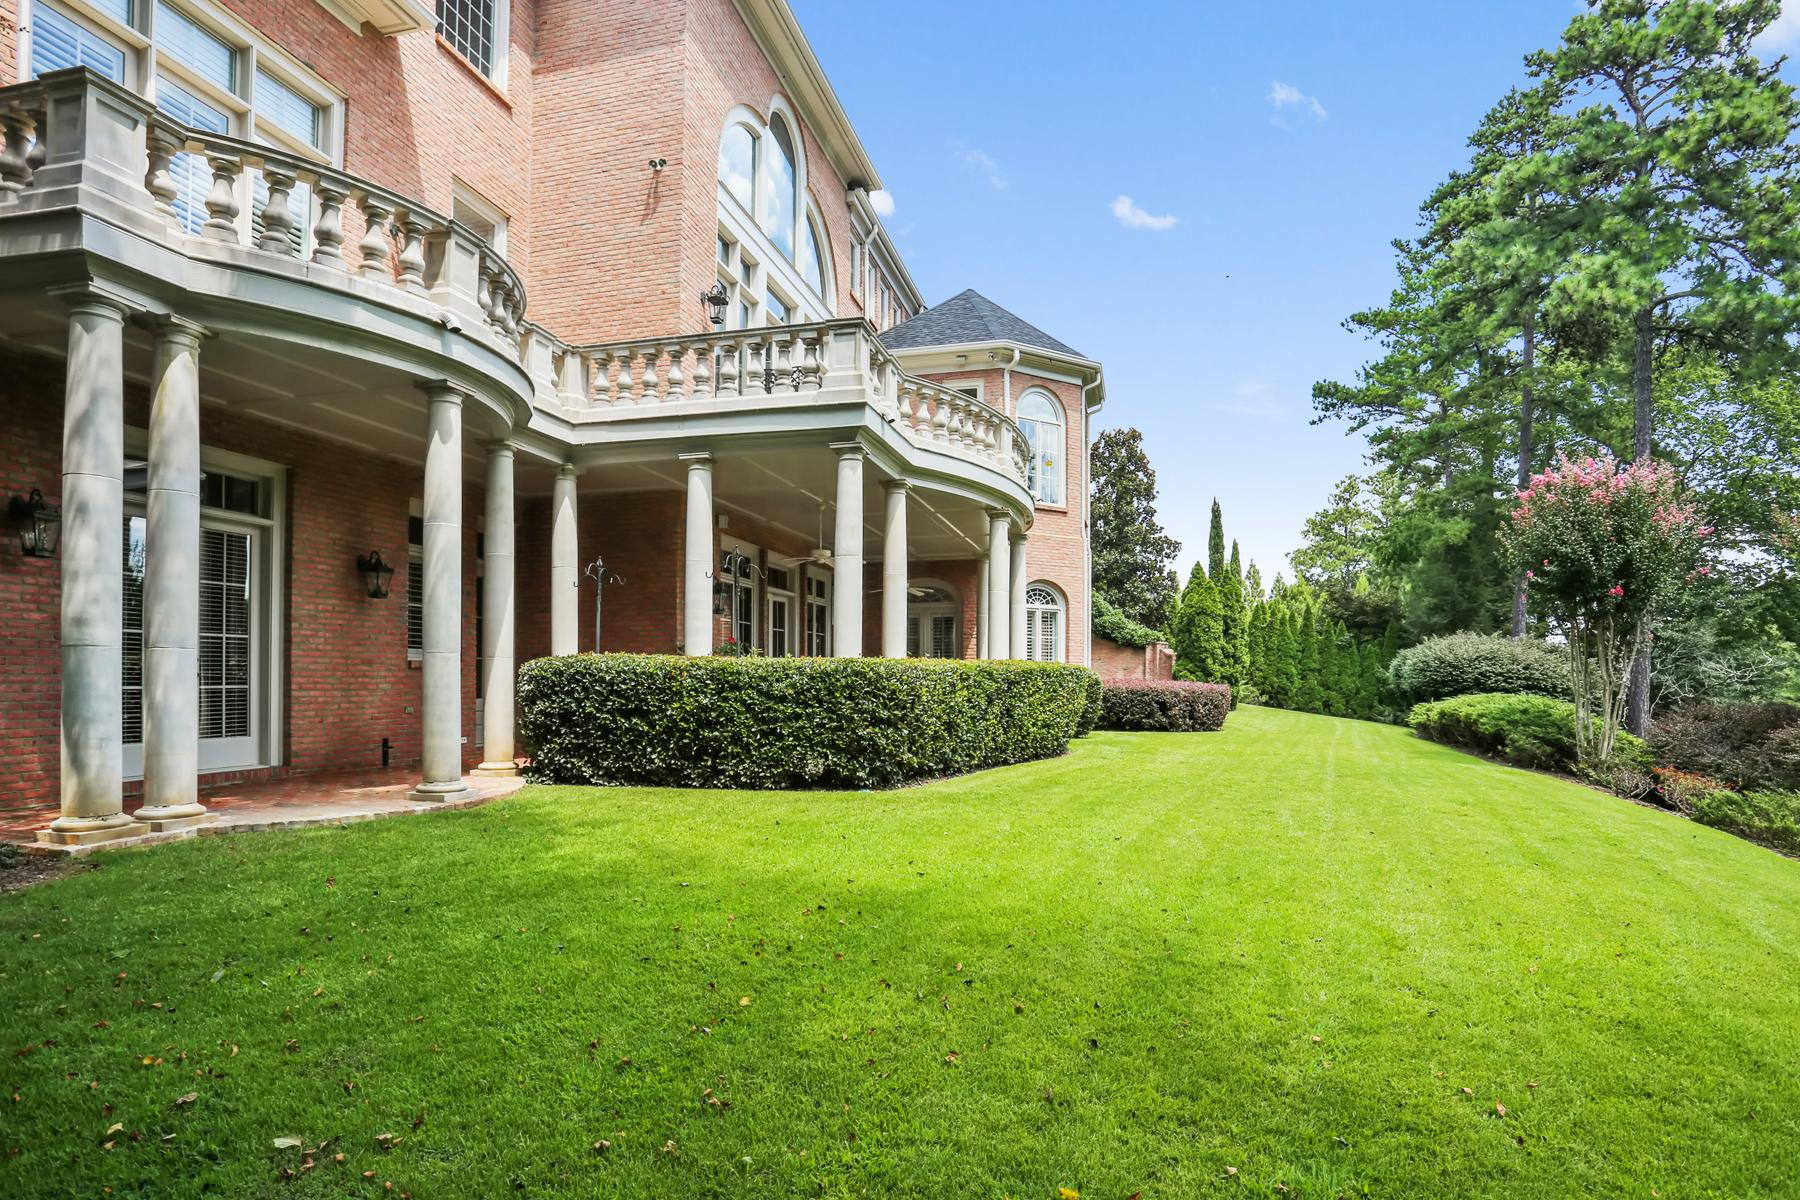 Additional photo for property listing at Stunning Custom Home On Jack Nicklaus 18th Hole 1008 Cherbury Lane Johns Creek, Georgia 30022 United States